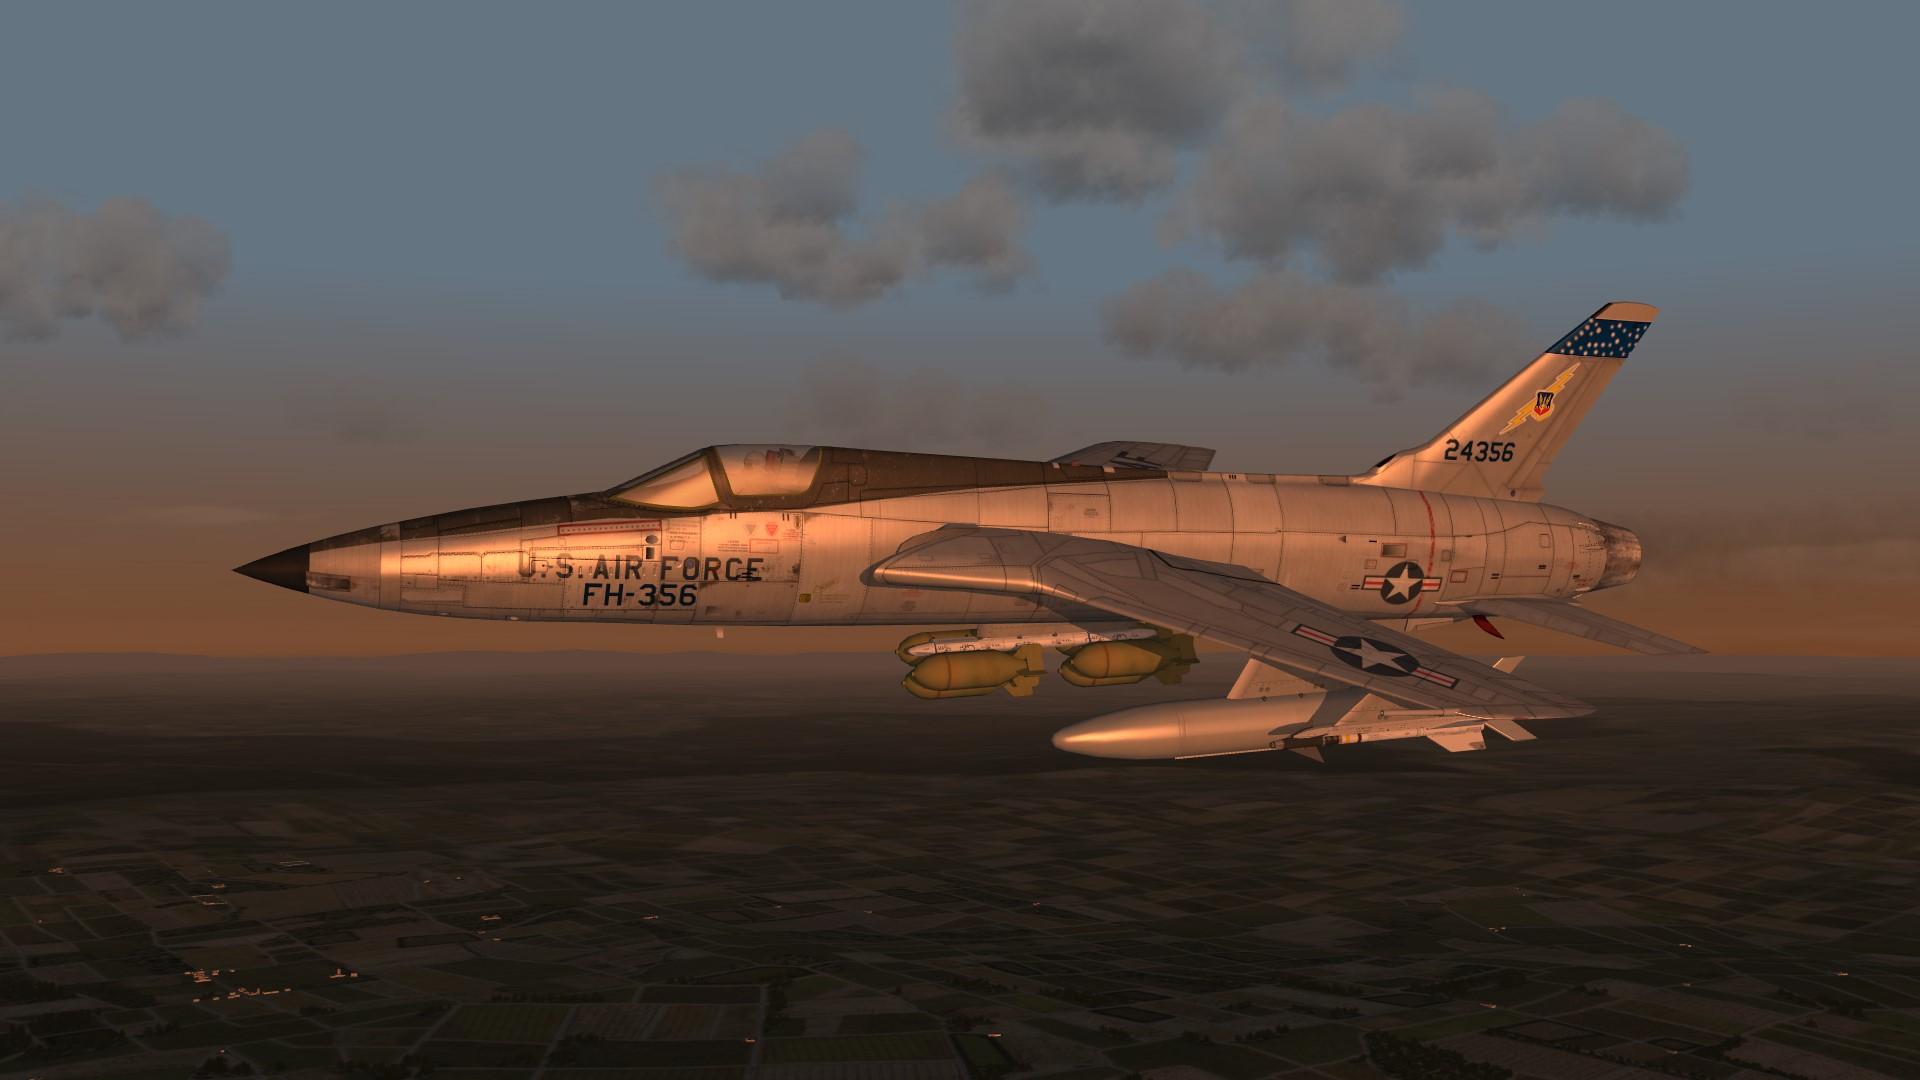 1962 F105B over W.Germany